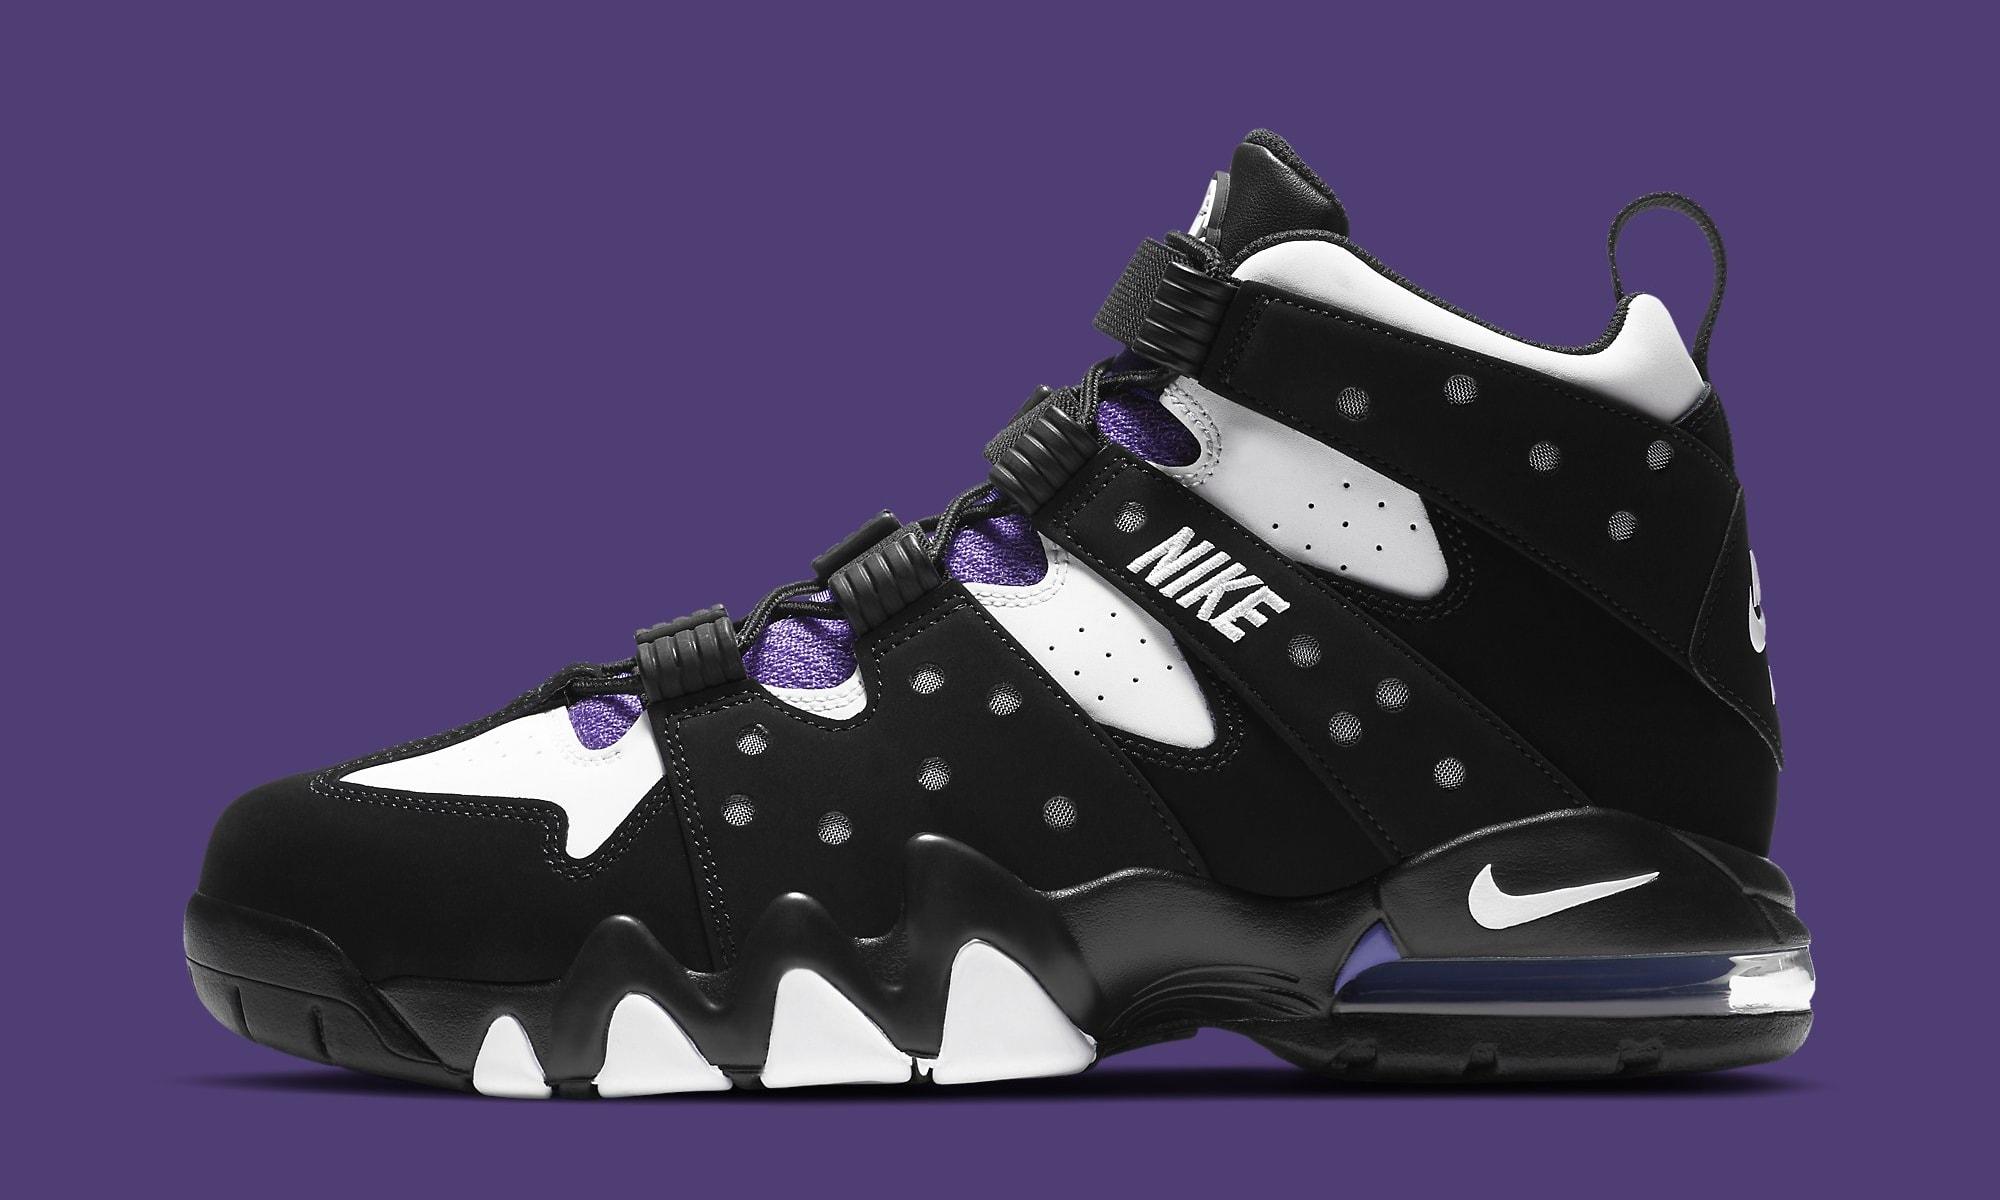 Nike Air Max CB 94 'Varsity Purple' CZ7871-001 Lateral